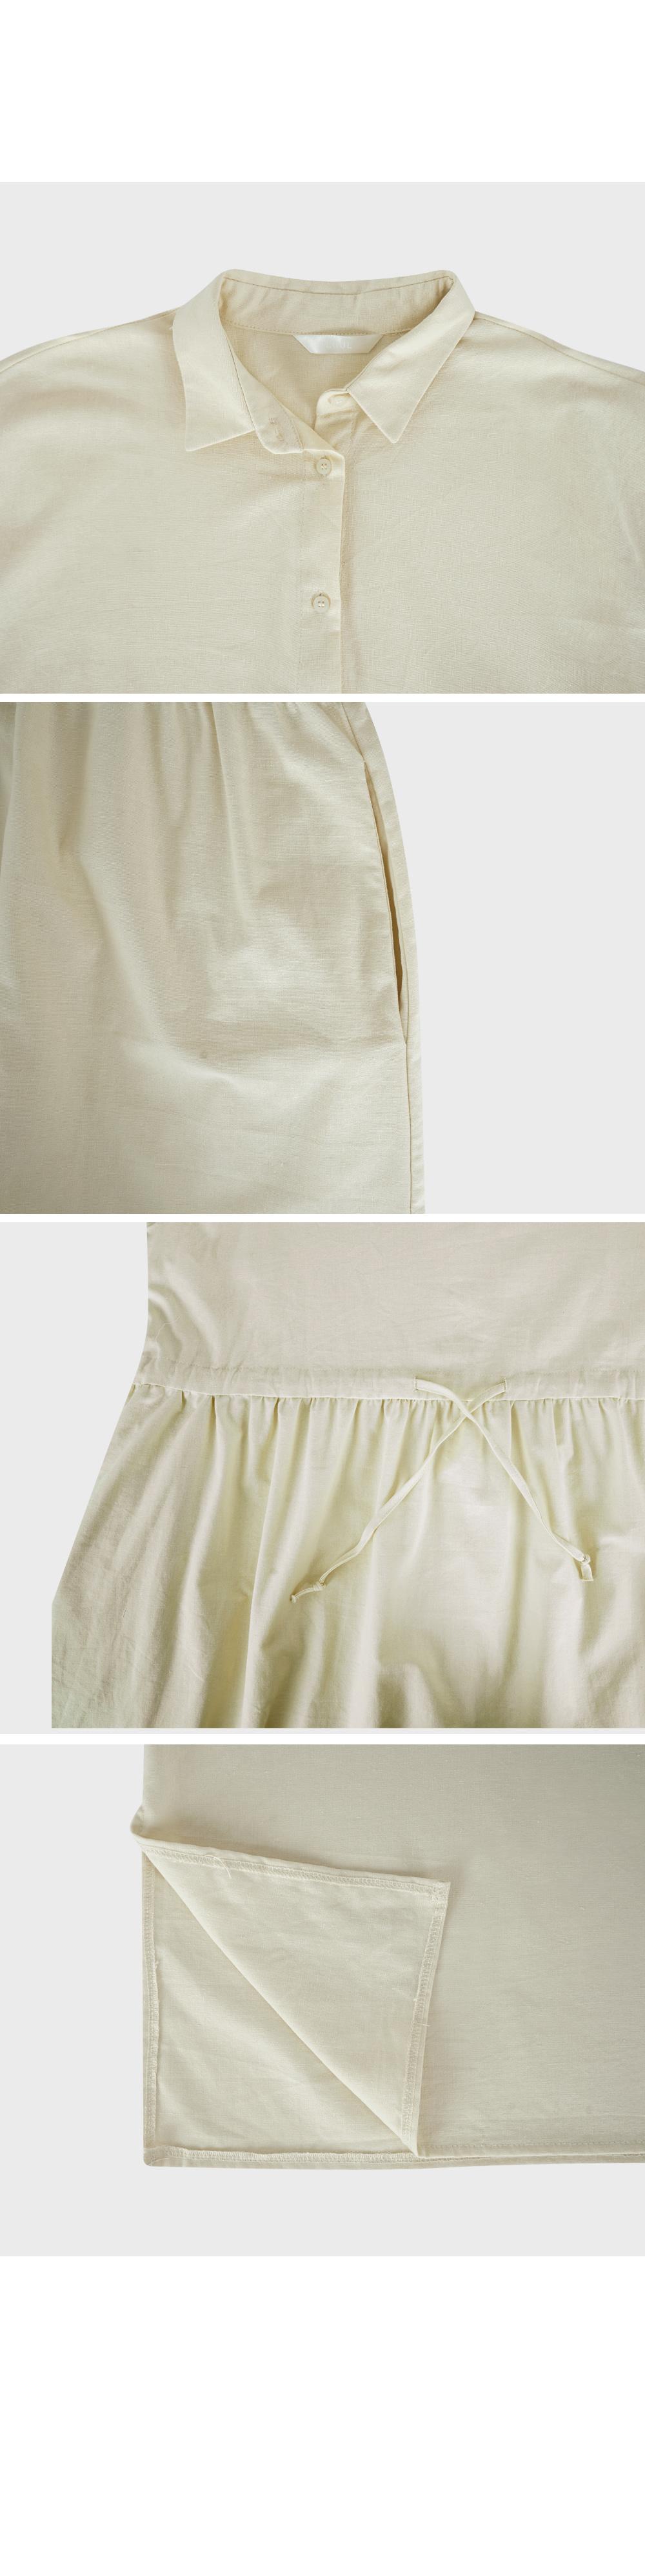 A-Line Button Front Dress-Holiholic